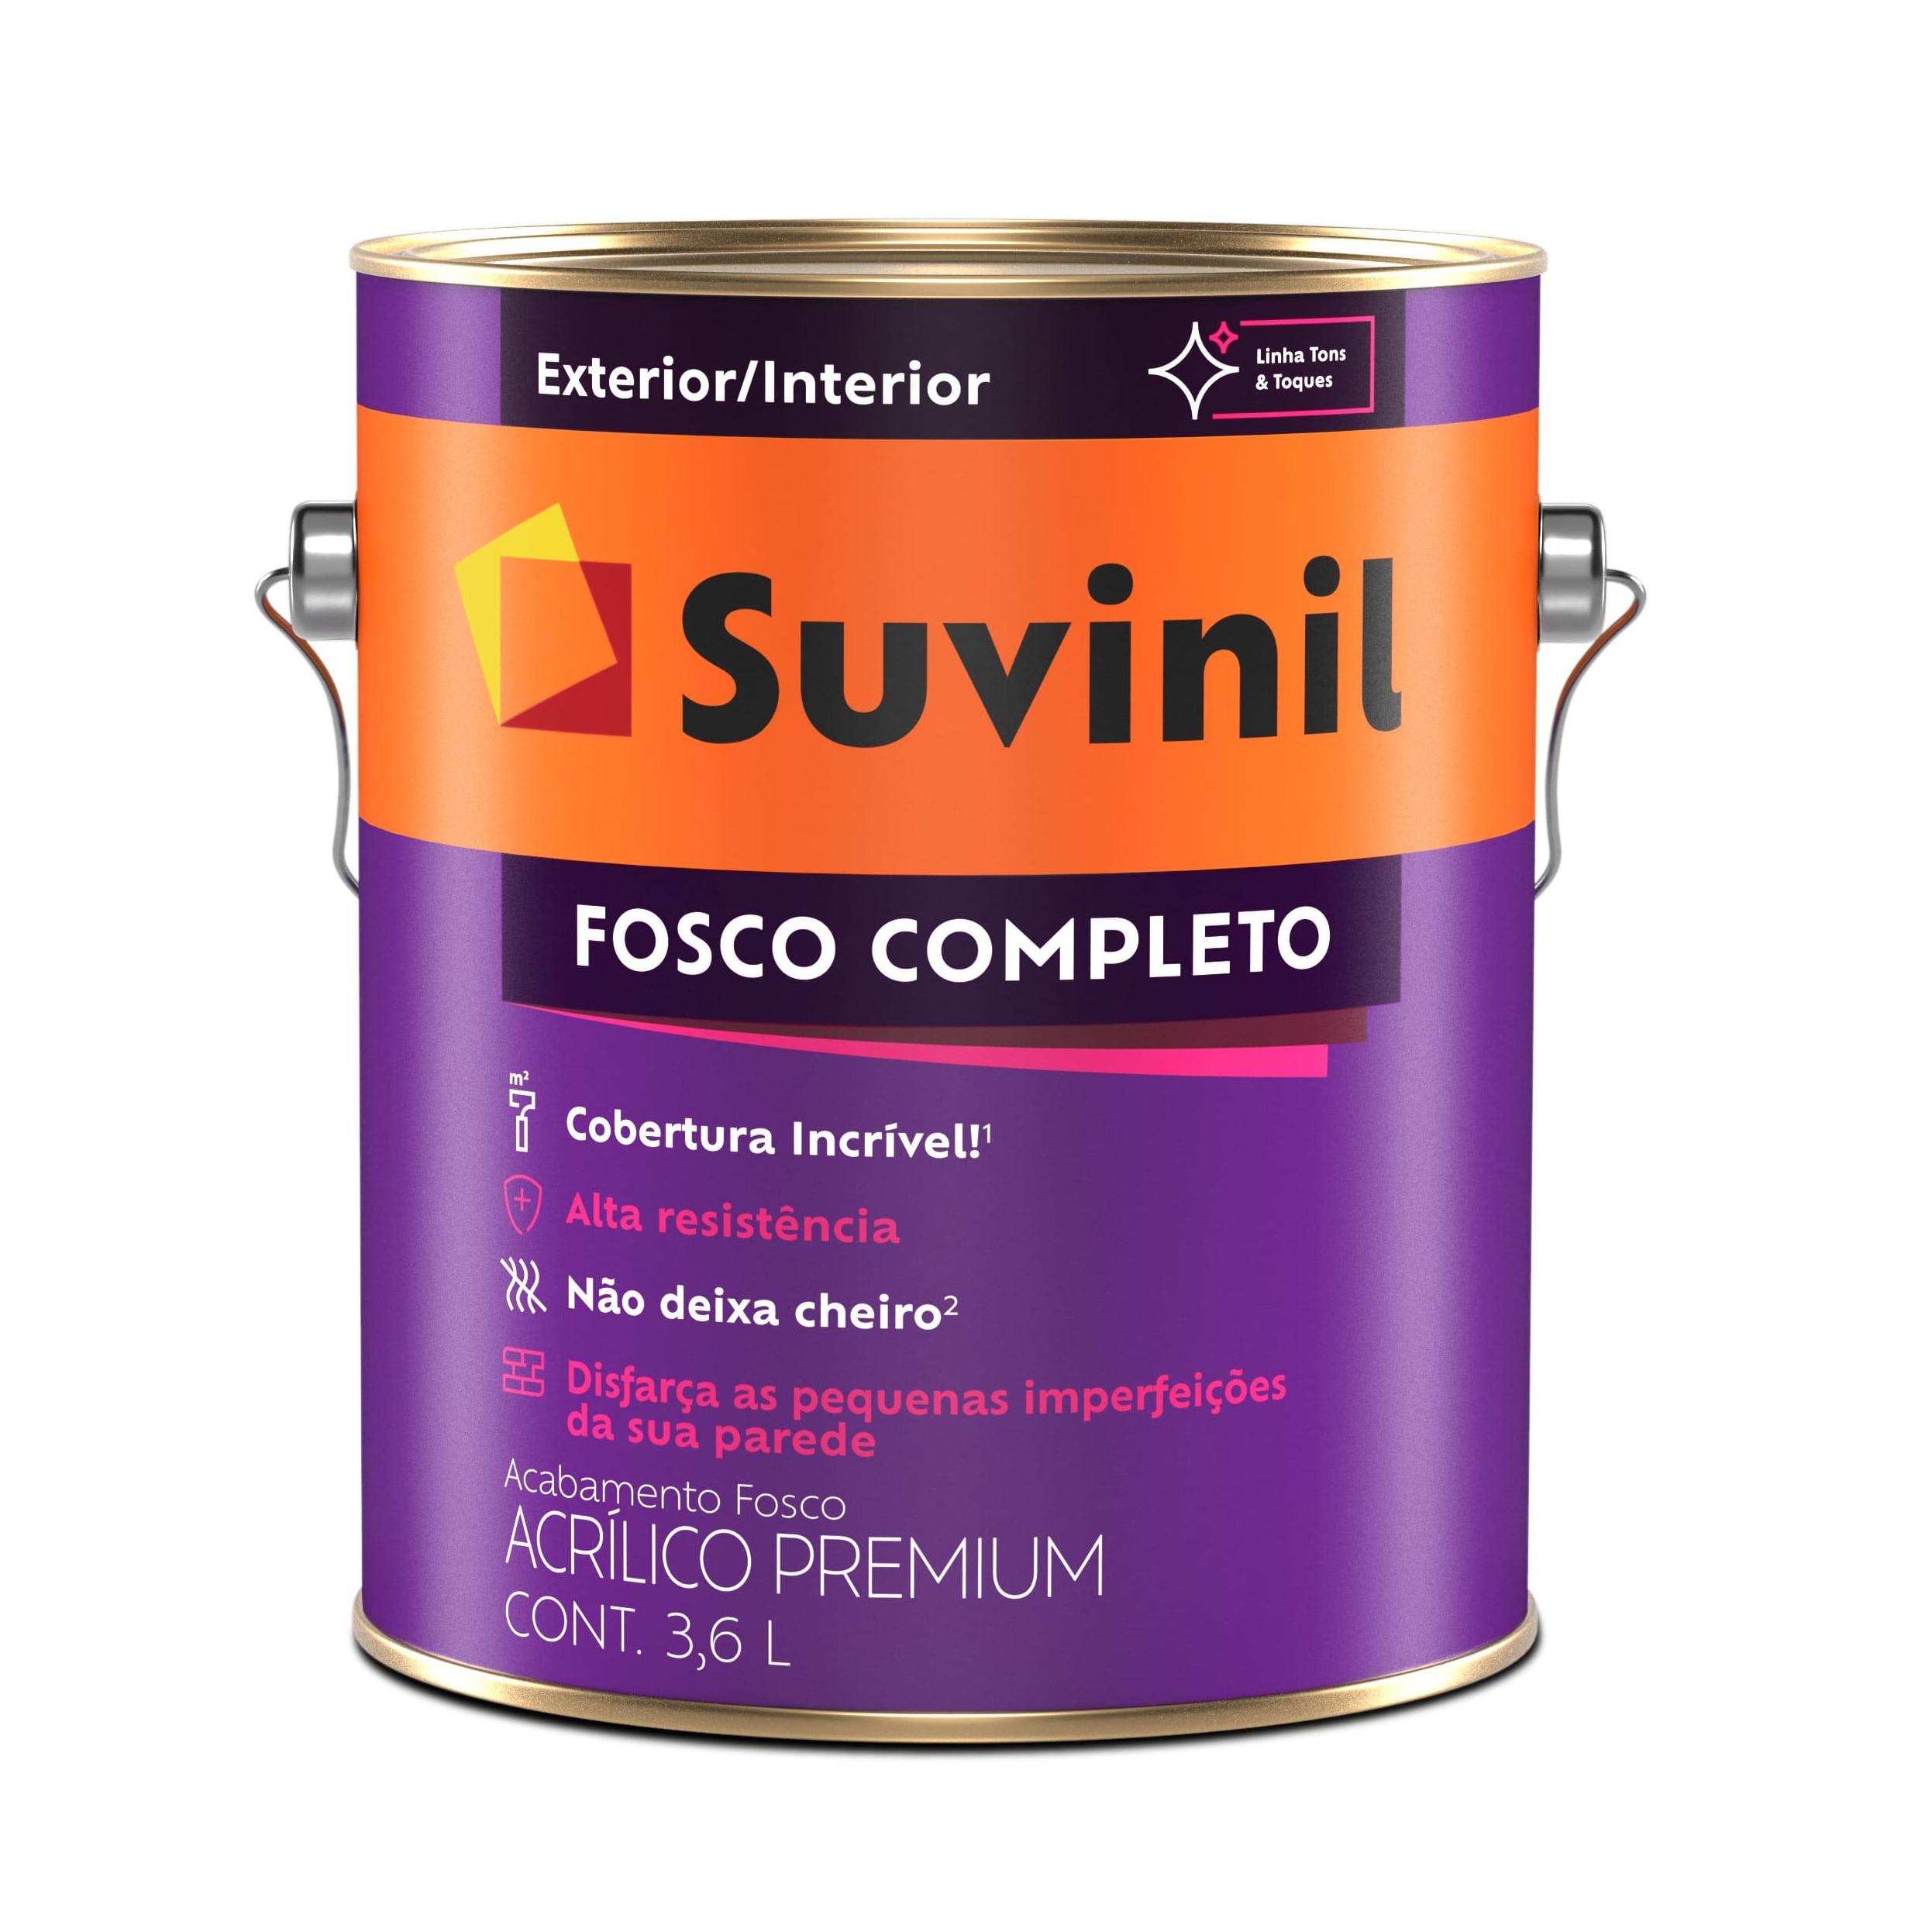 TINTA ACRÍLICA PREMIUM FOSCO COMPLETO SUVINIL